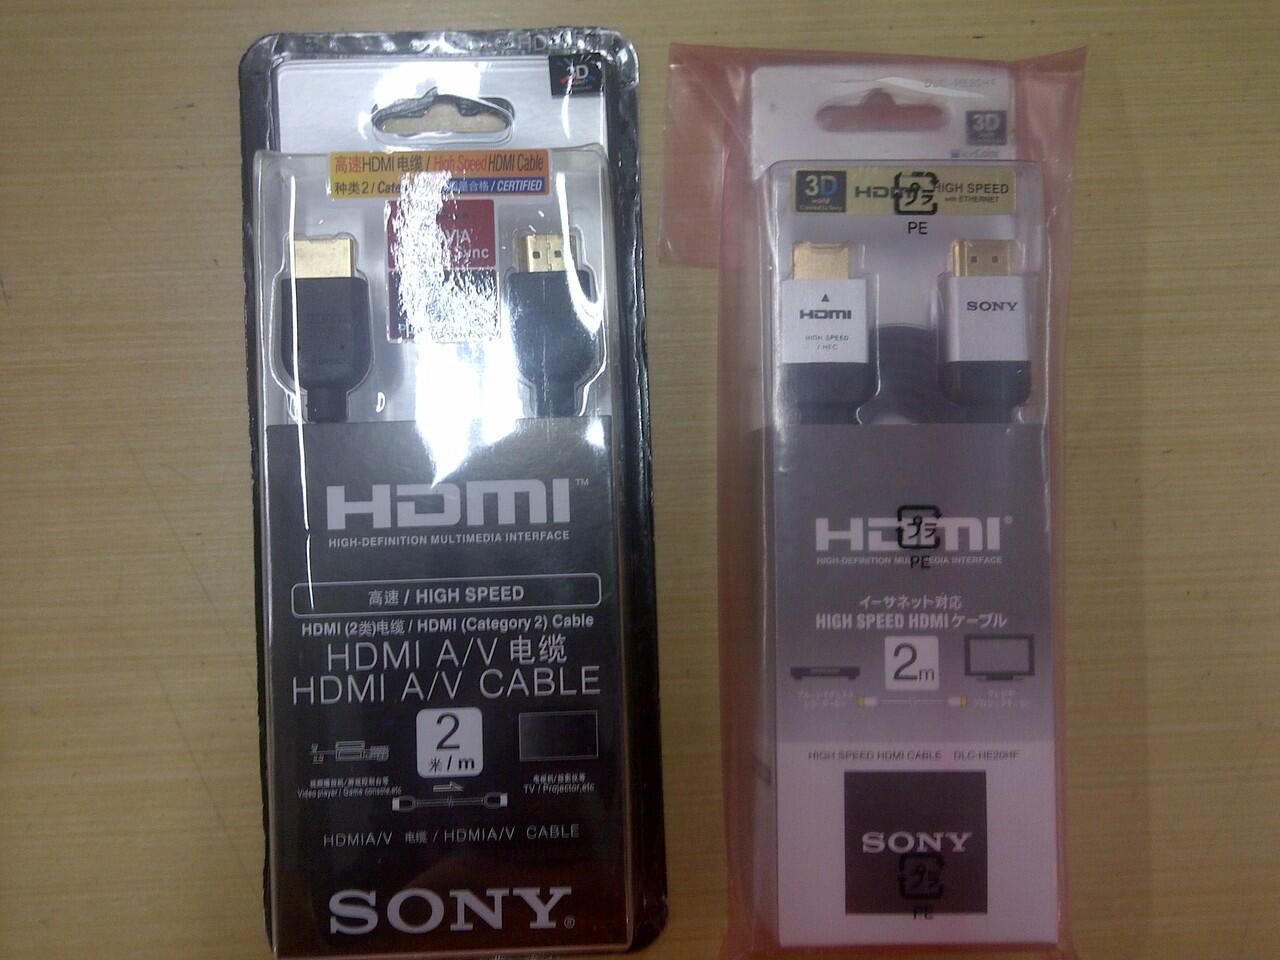 KABEL HDMI SONY 2METER FLAT PIPIH DLC-HE20HF ORIGINAL VERSI1.4 3D SUPPORT GOLD PLATED